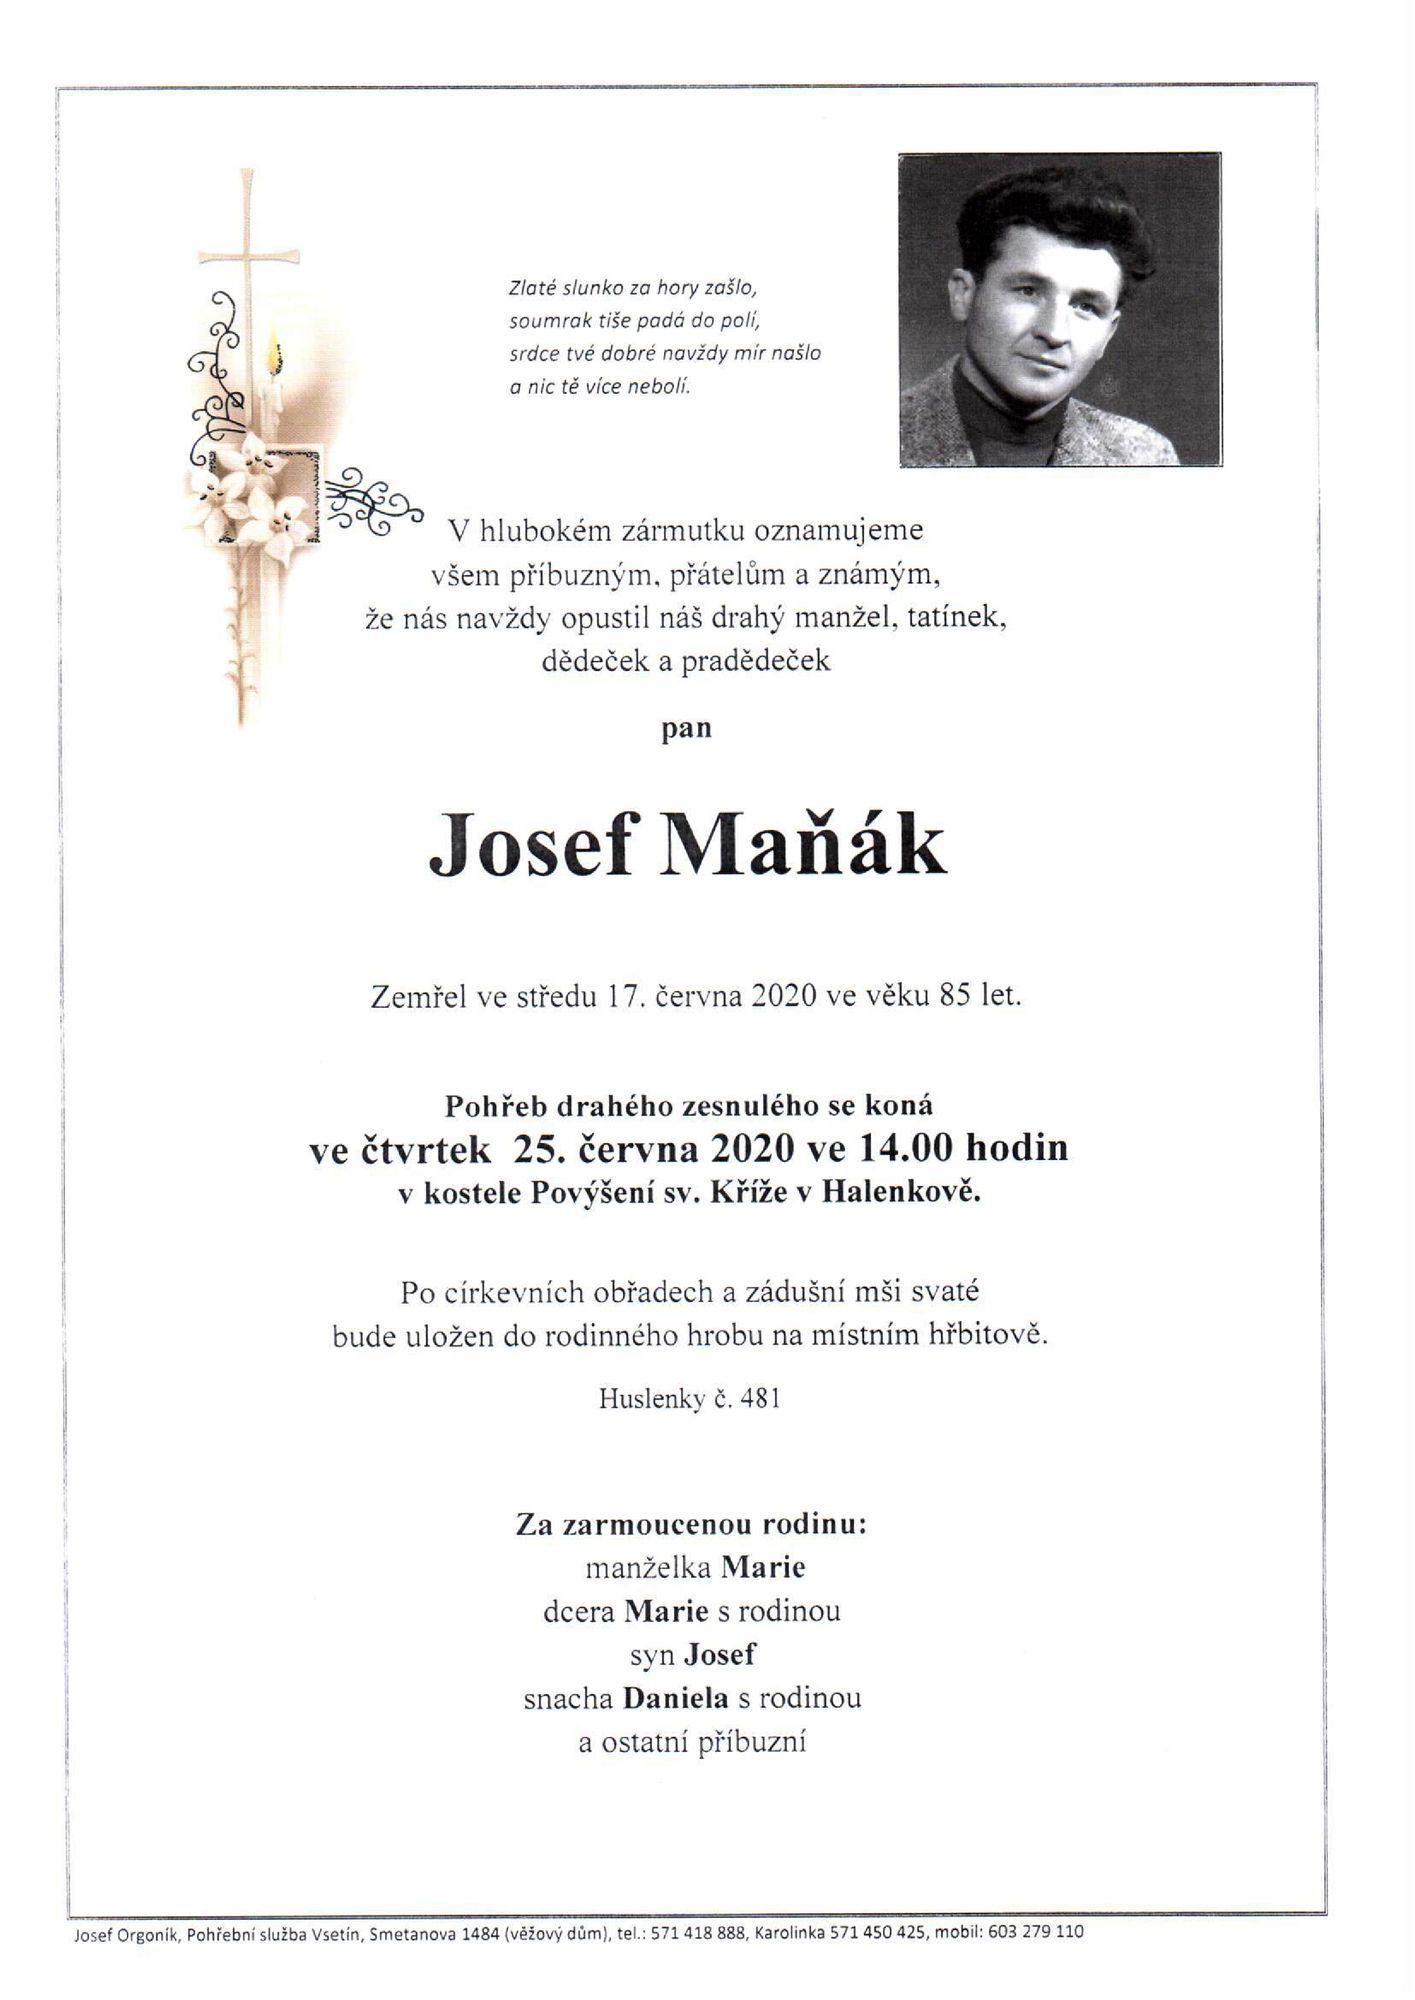 Josef Maňák